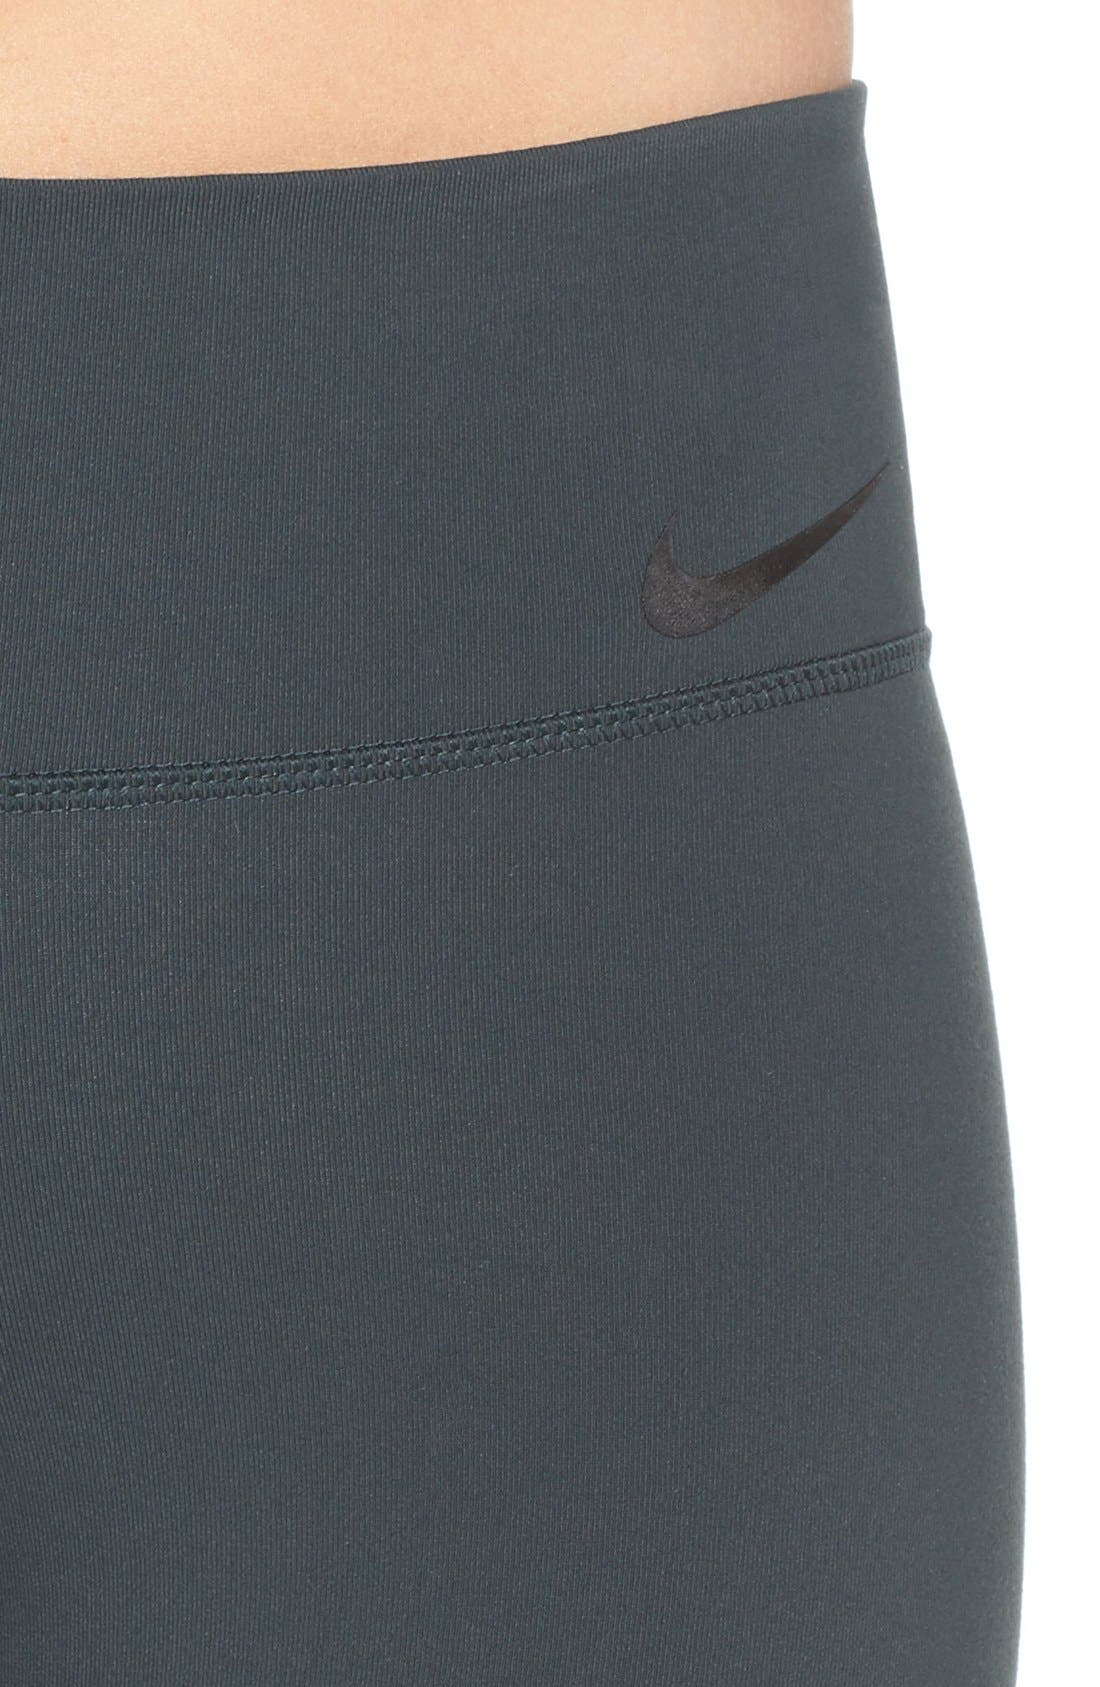 Alternate Image 4  - Nike 'Power Legendary' Dri-FIT Training Capris